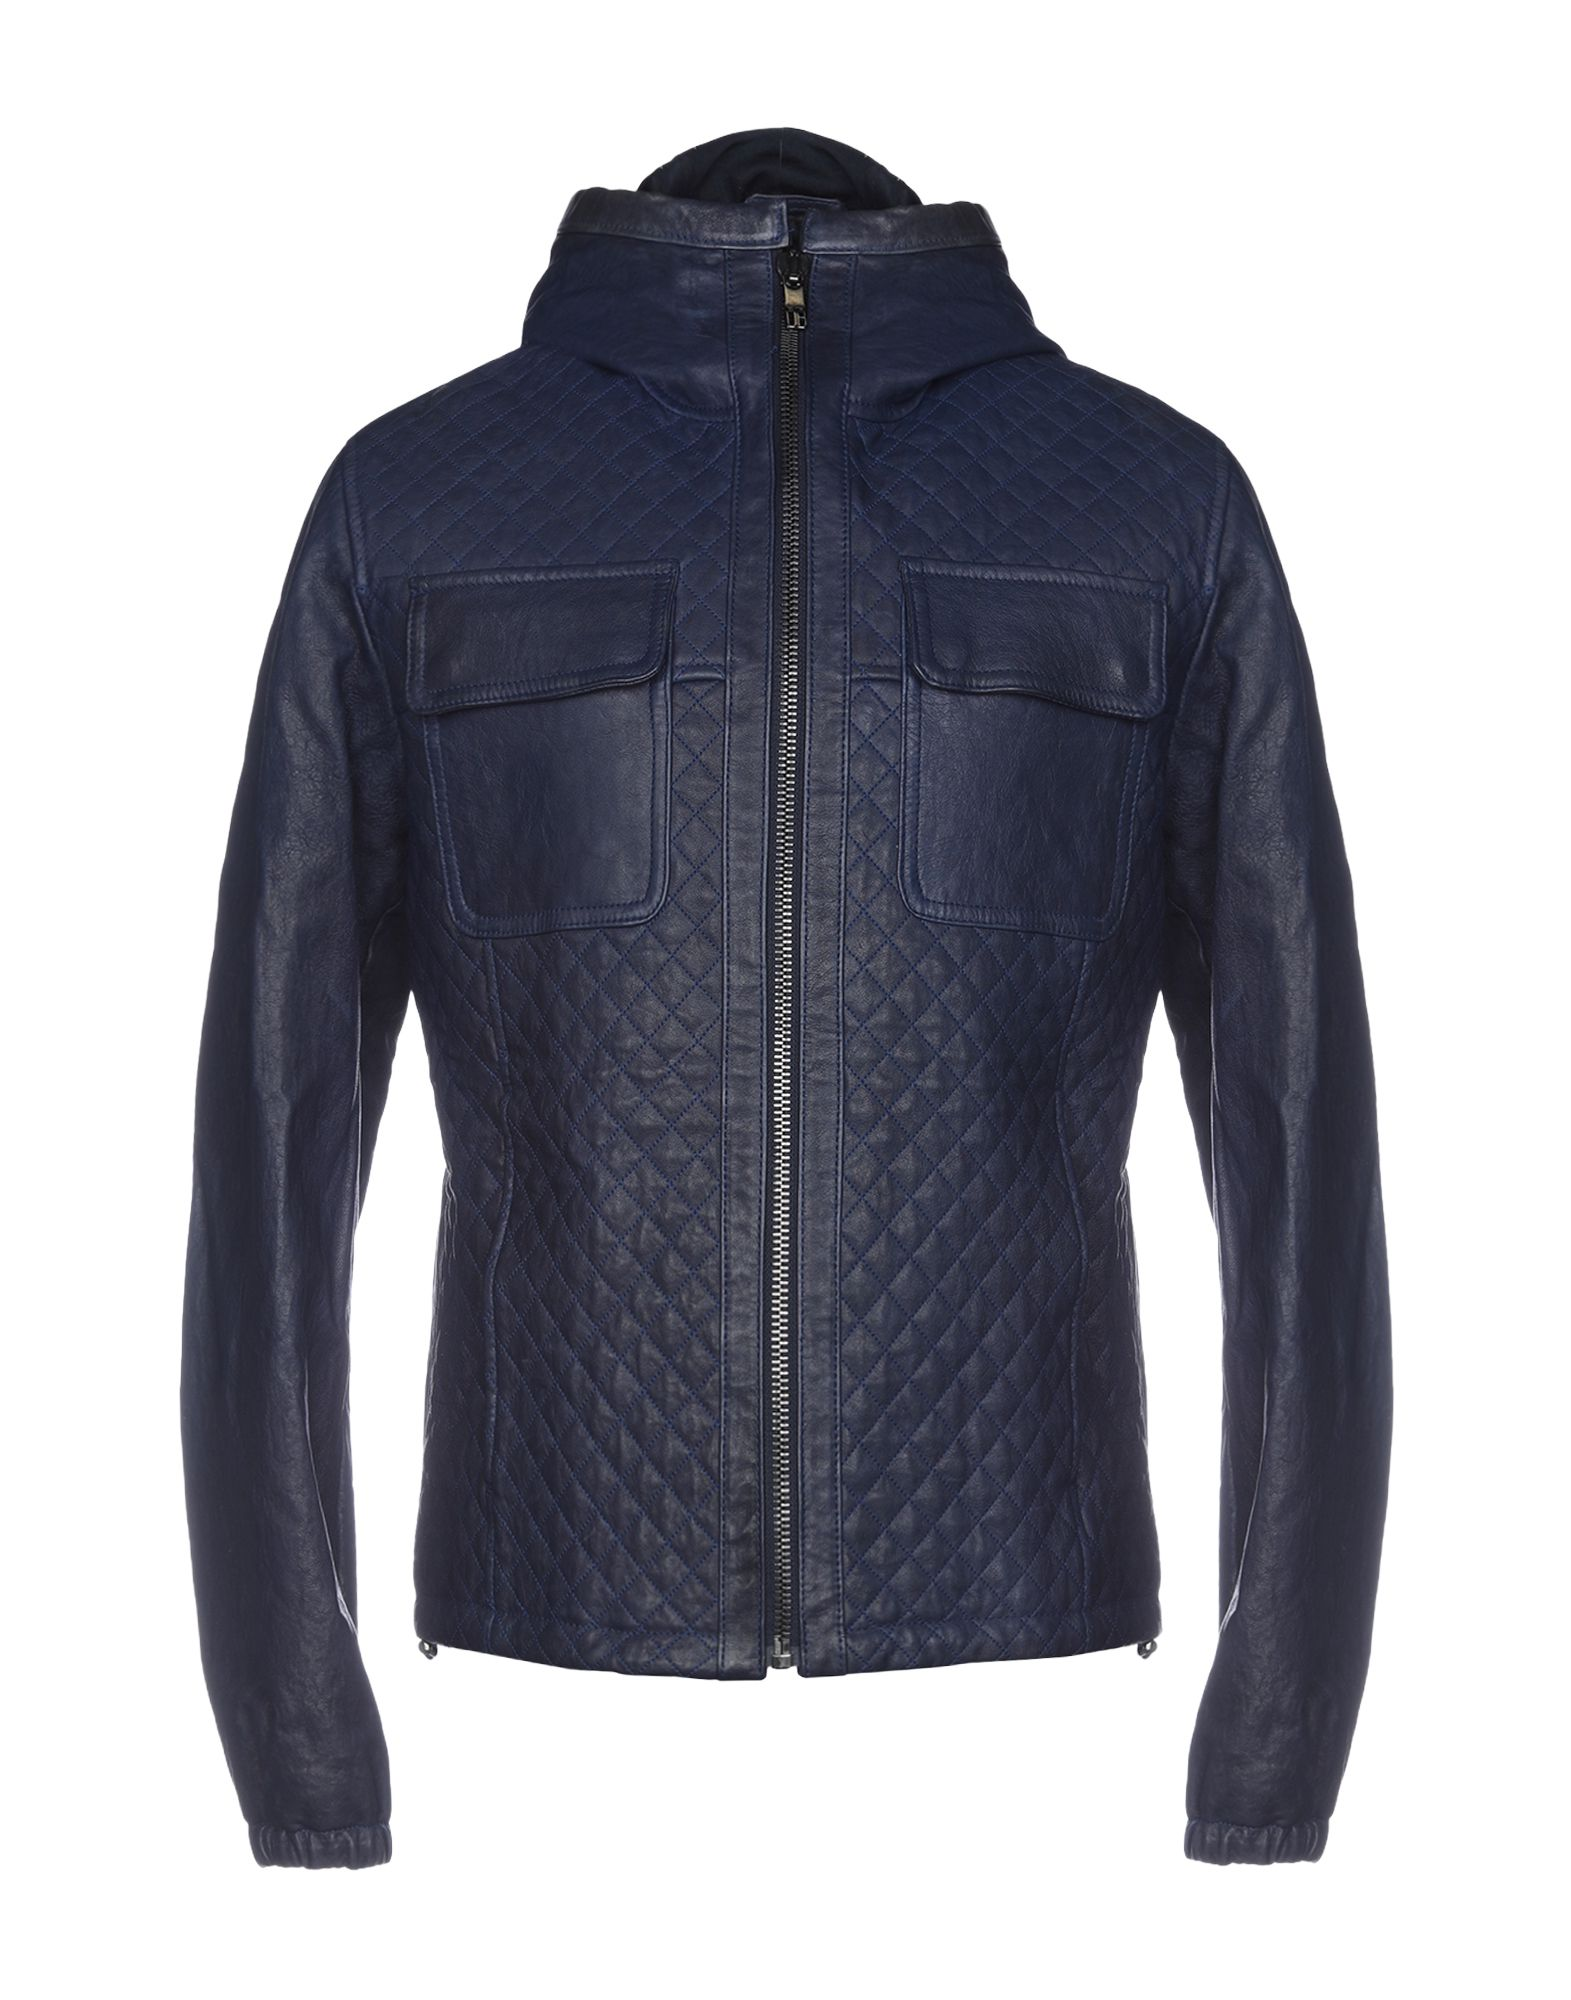 BIKKEMBERGS Jackets in Dark Blue